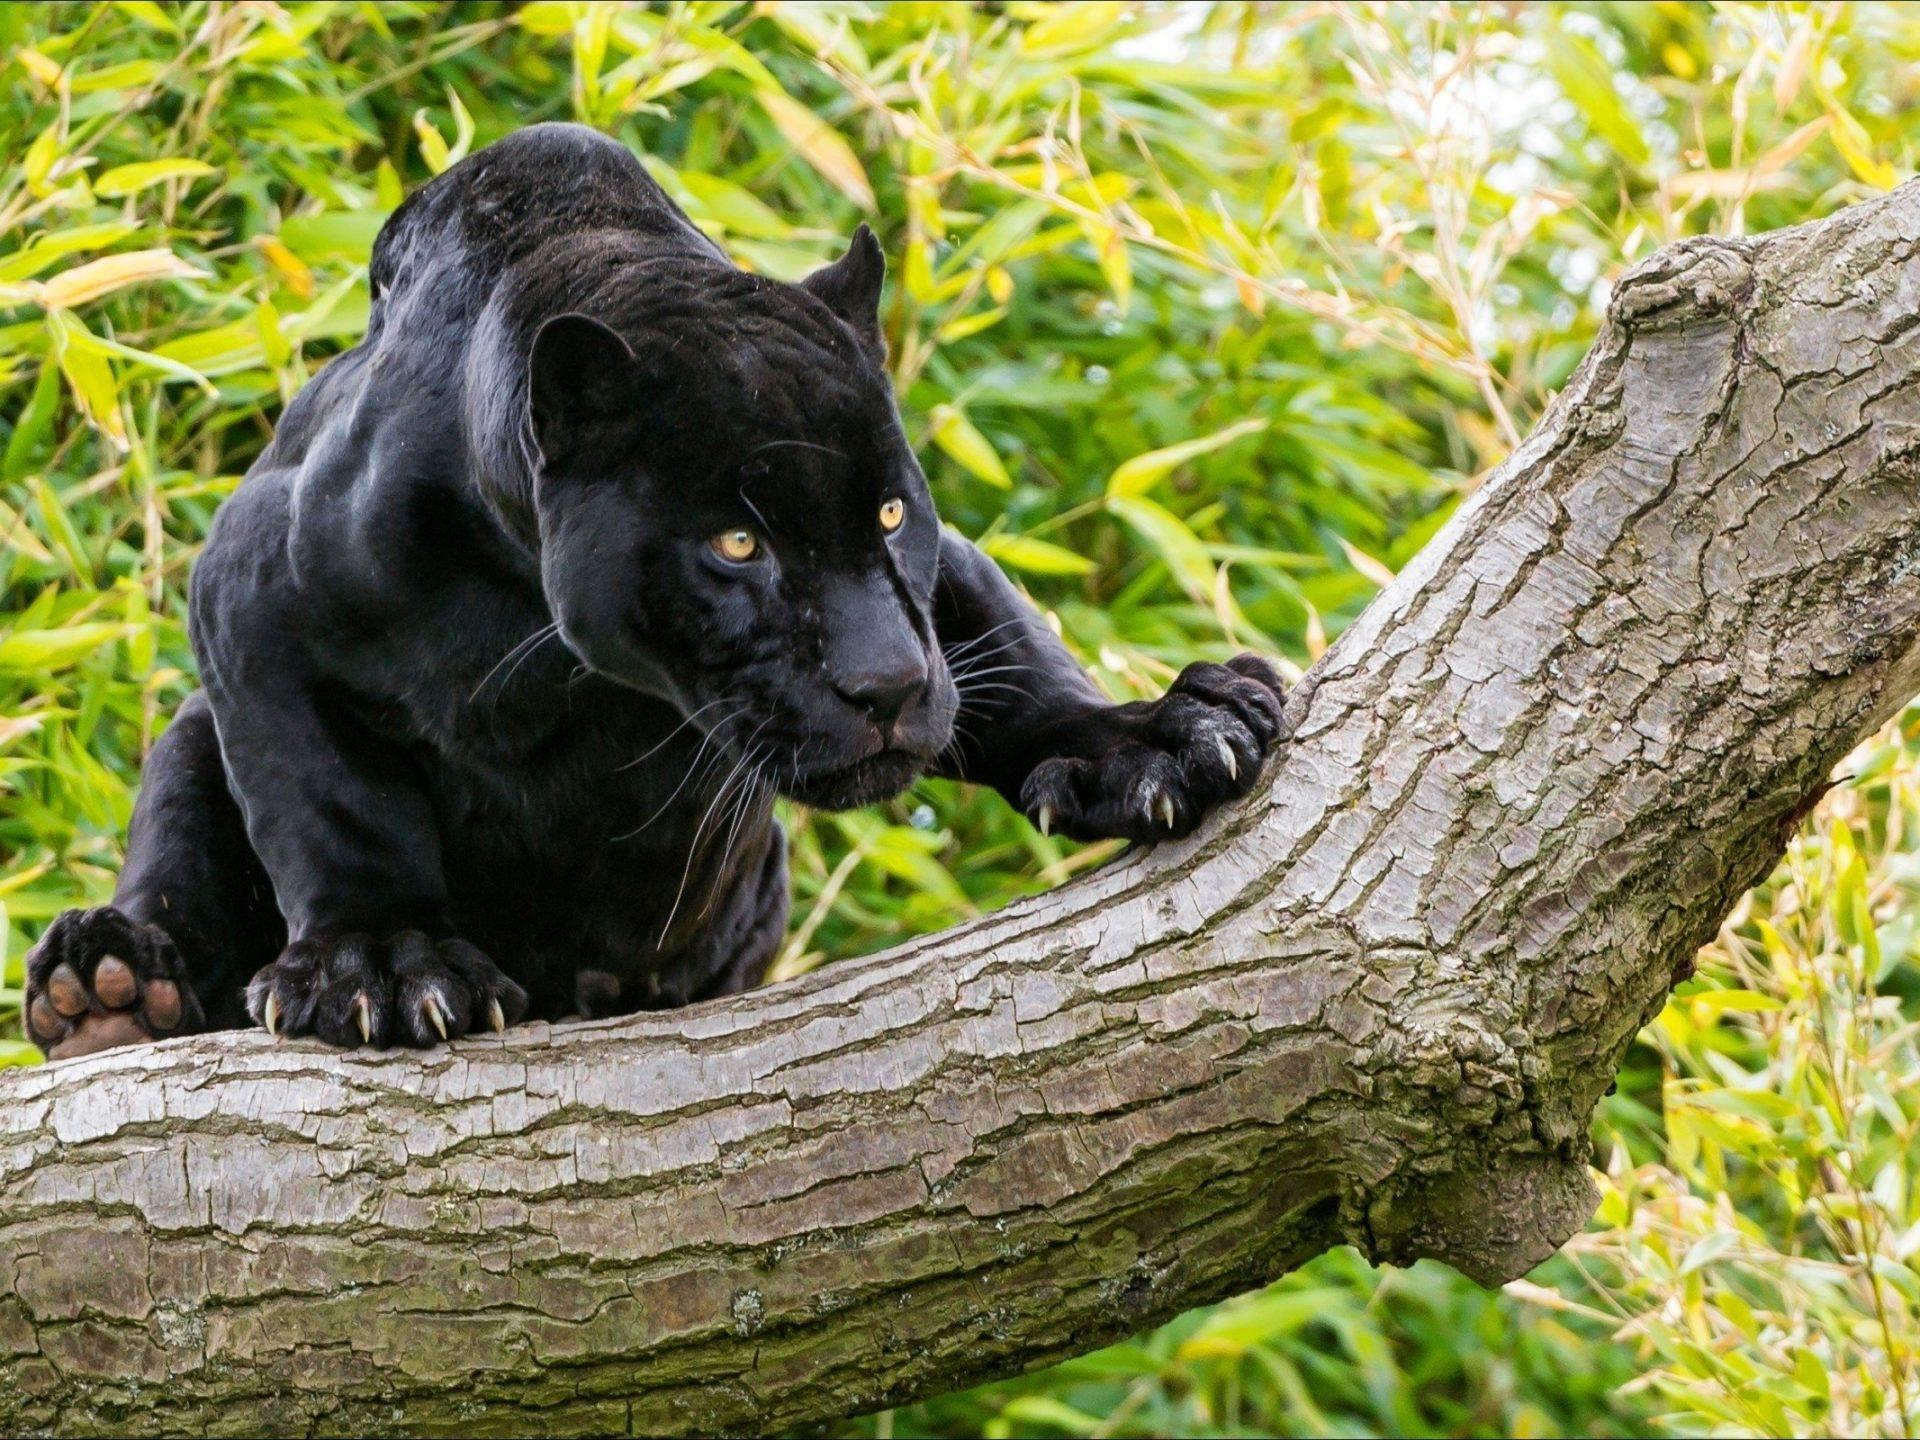 White Tiger Wallpaper Hd 1080p Animals Black Panther On A Tree Desktop Wallpaper Hd